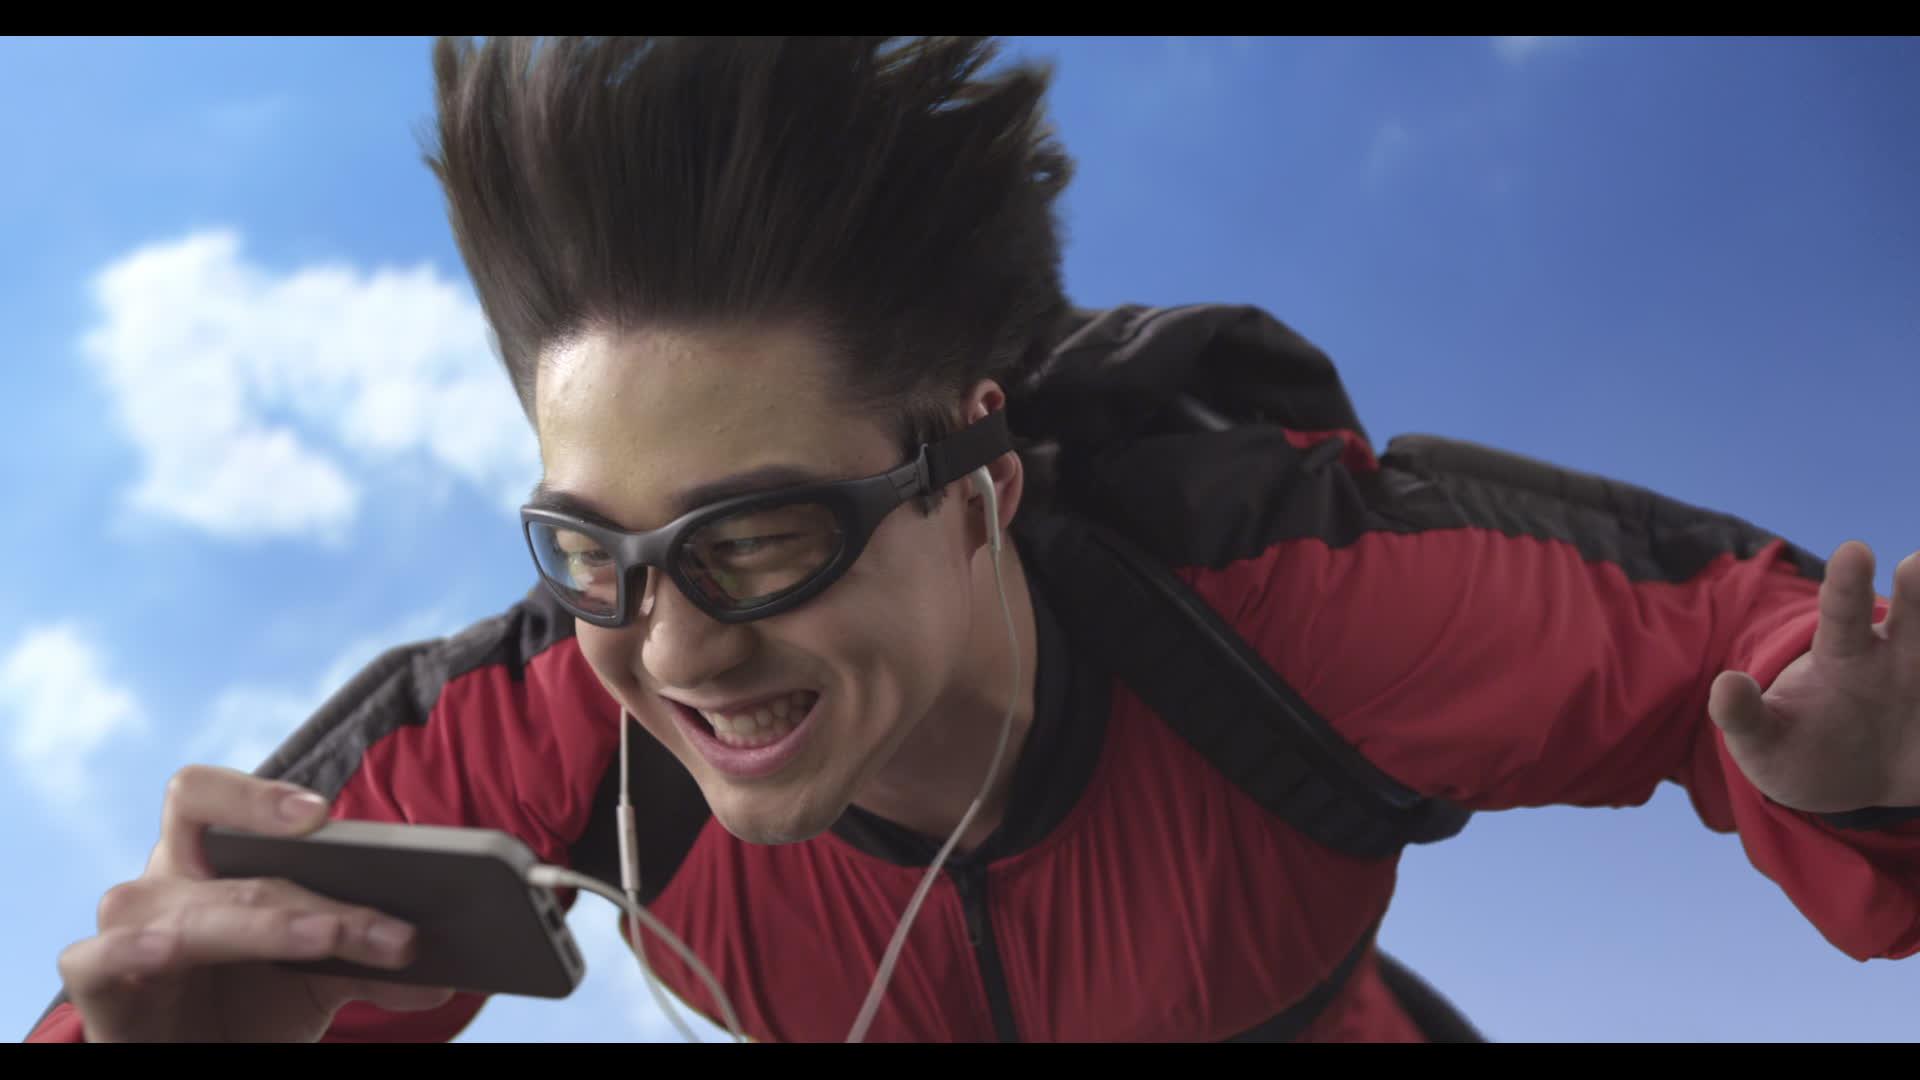 Official Viki Channel Episode 11: Viki Skydiving Commercial